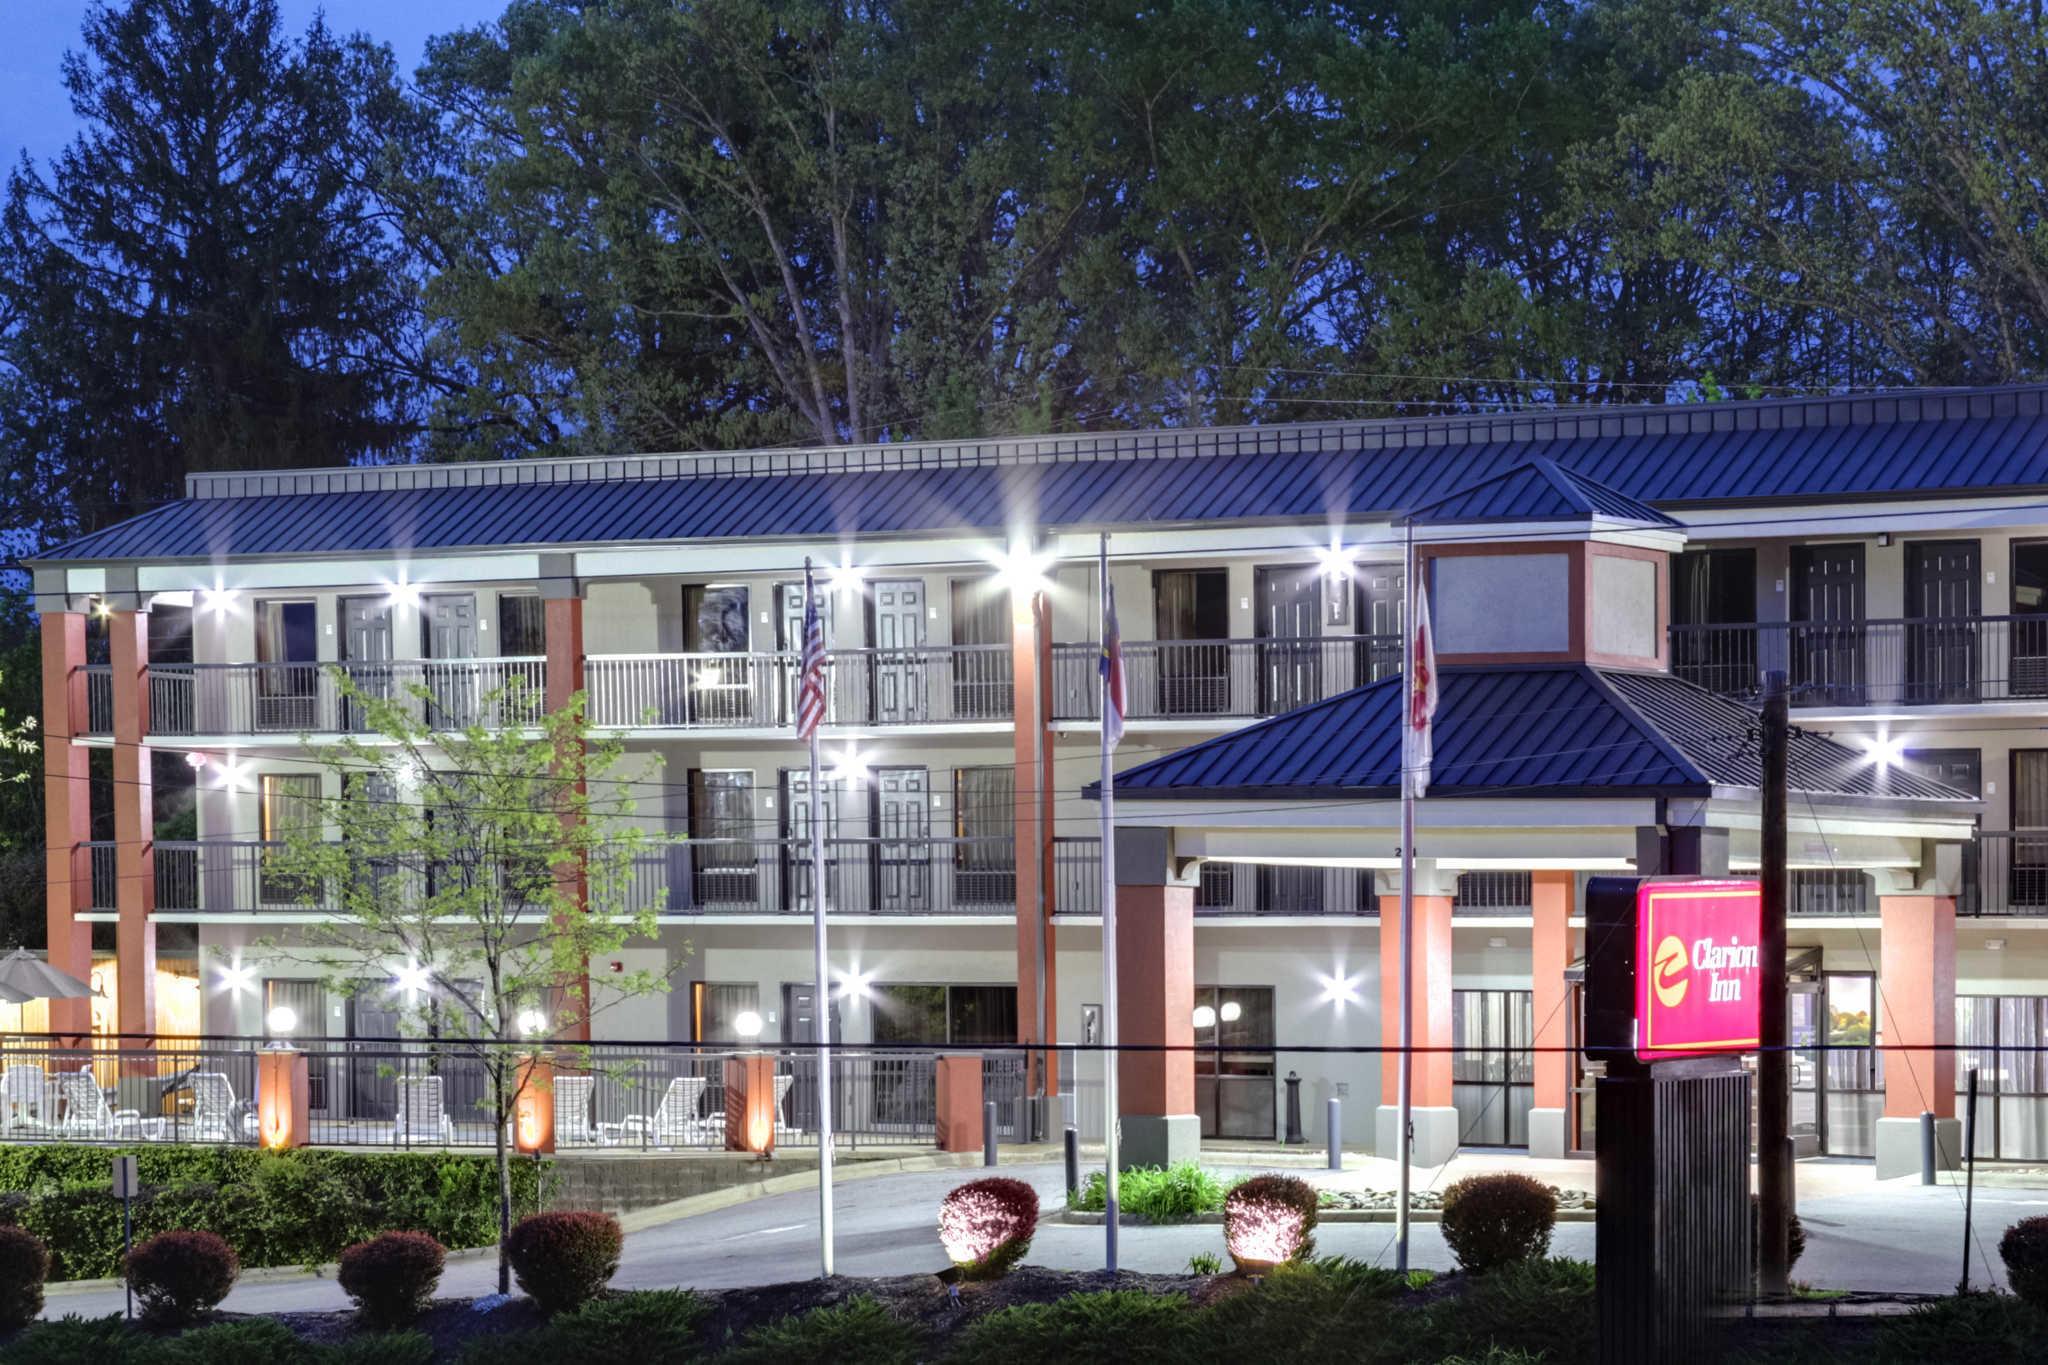 Clarion inn biltmore village in asheville nc 828 274 0 for Asheville arts and crafts biltmore village